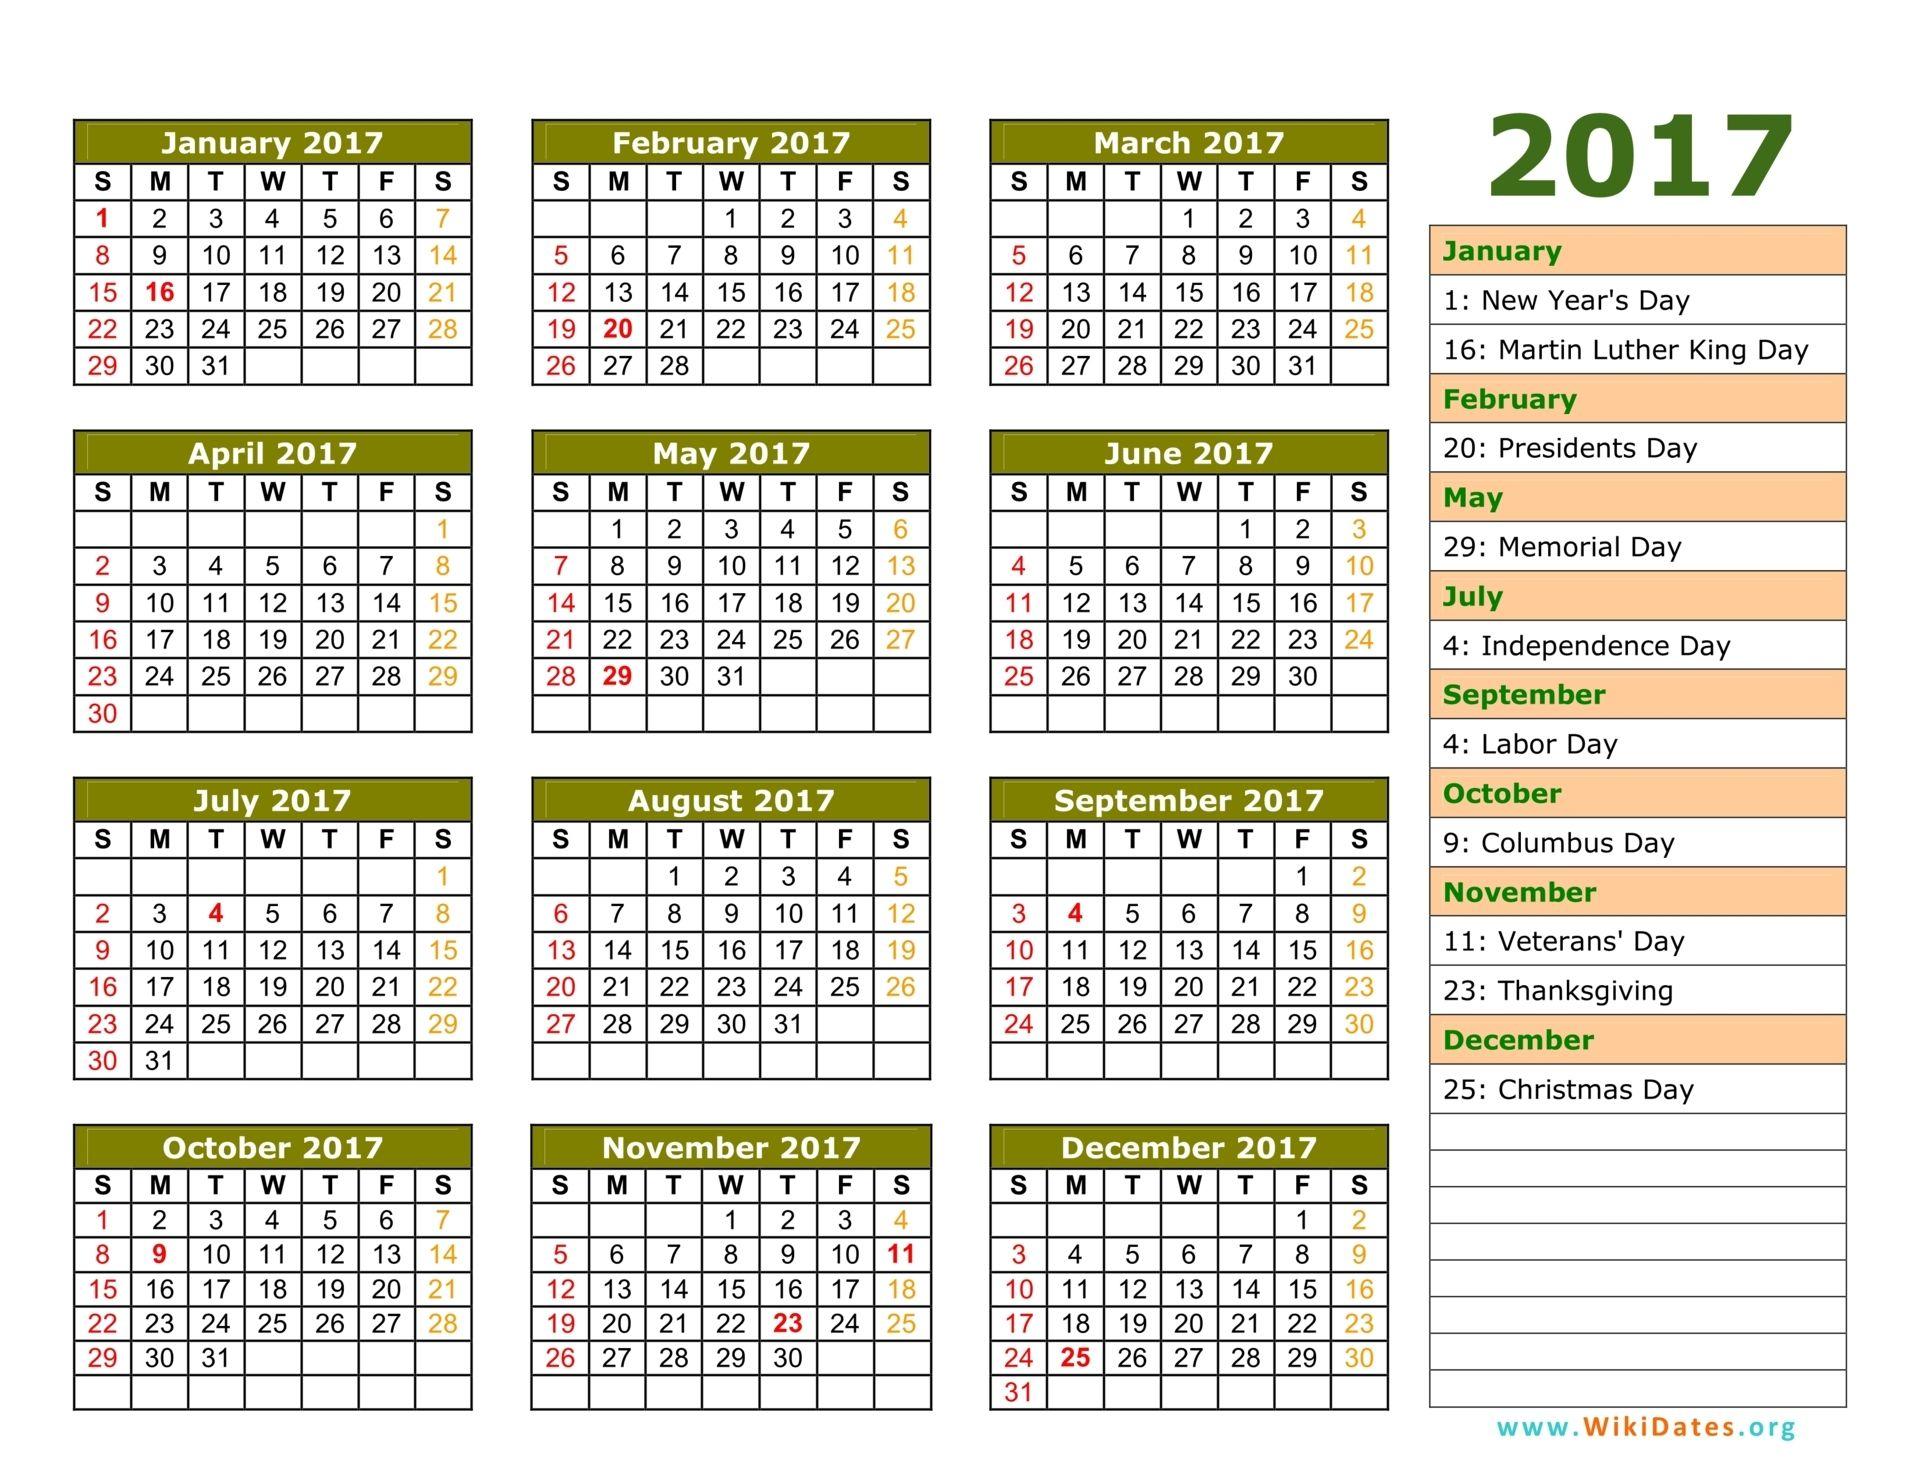 2017 Calendar With Holidays | 2017 calendar with holidays | 2017 ...